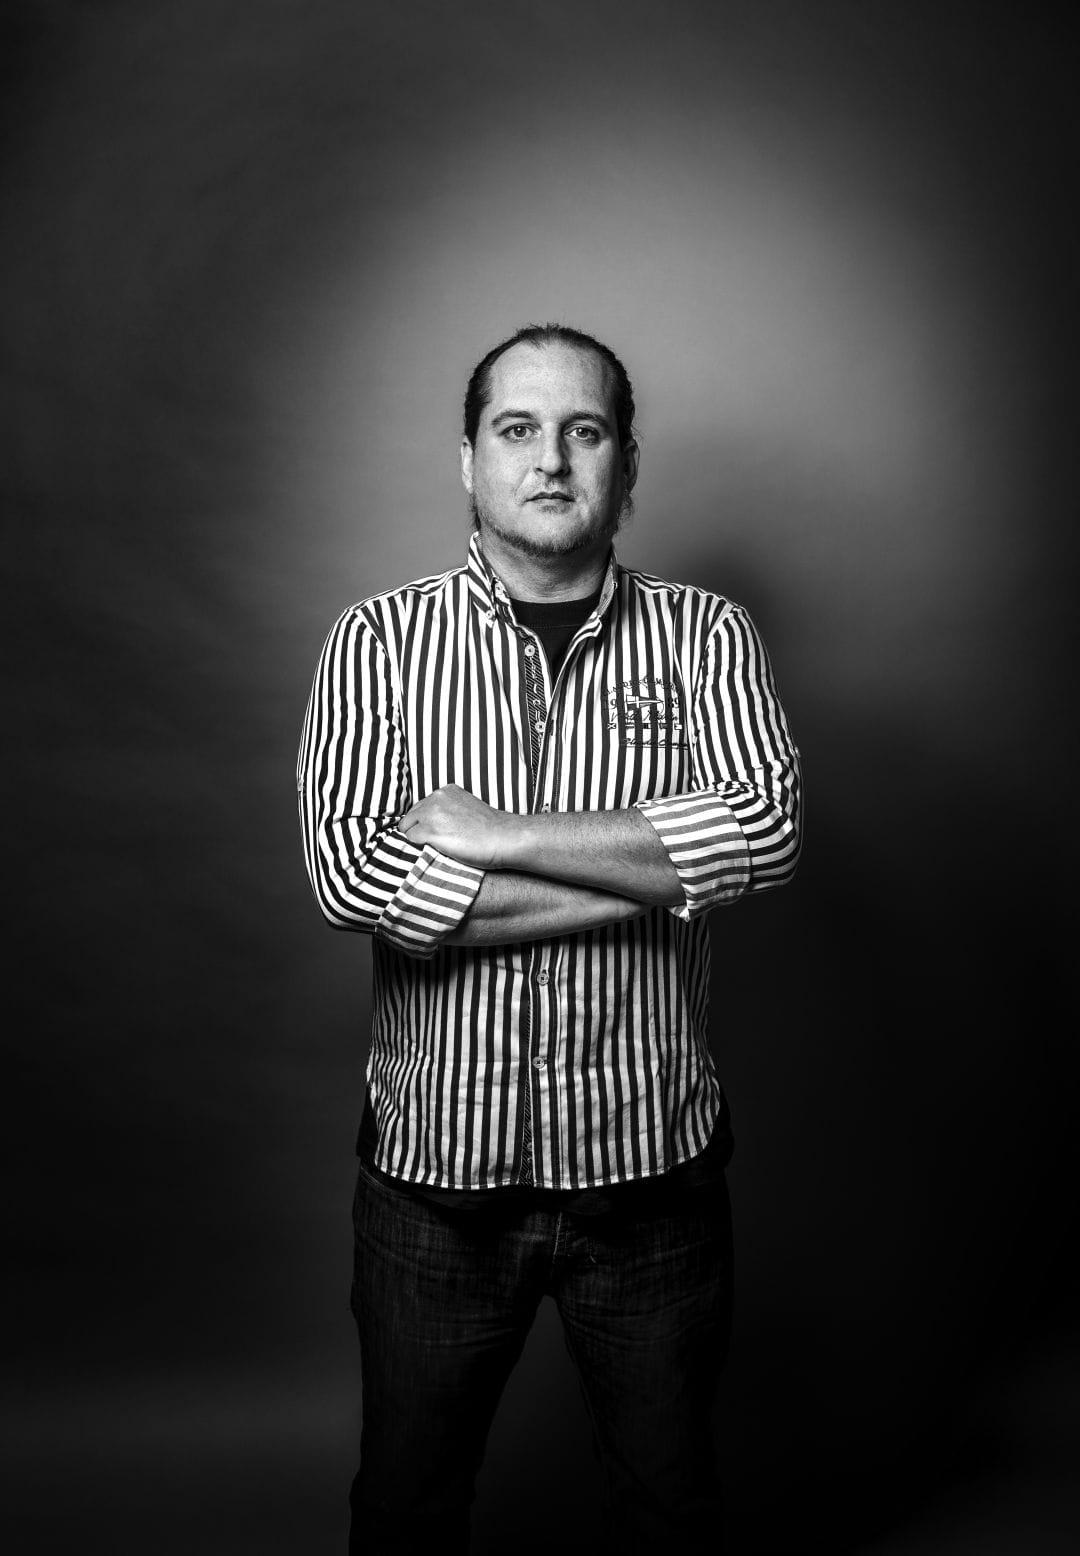 Michael Sternad